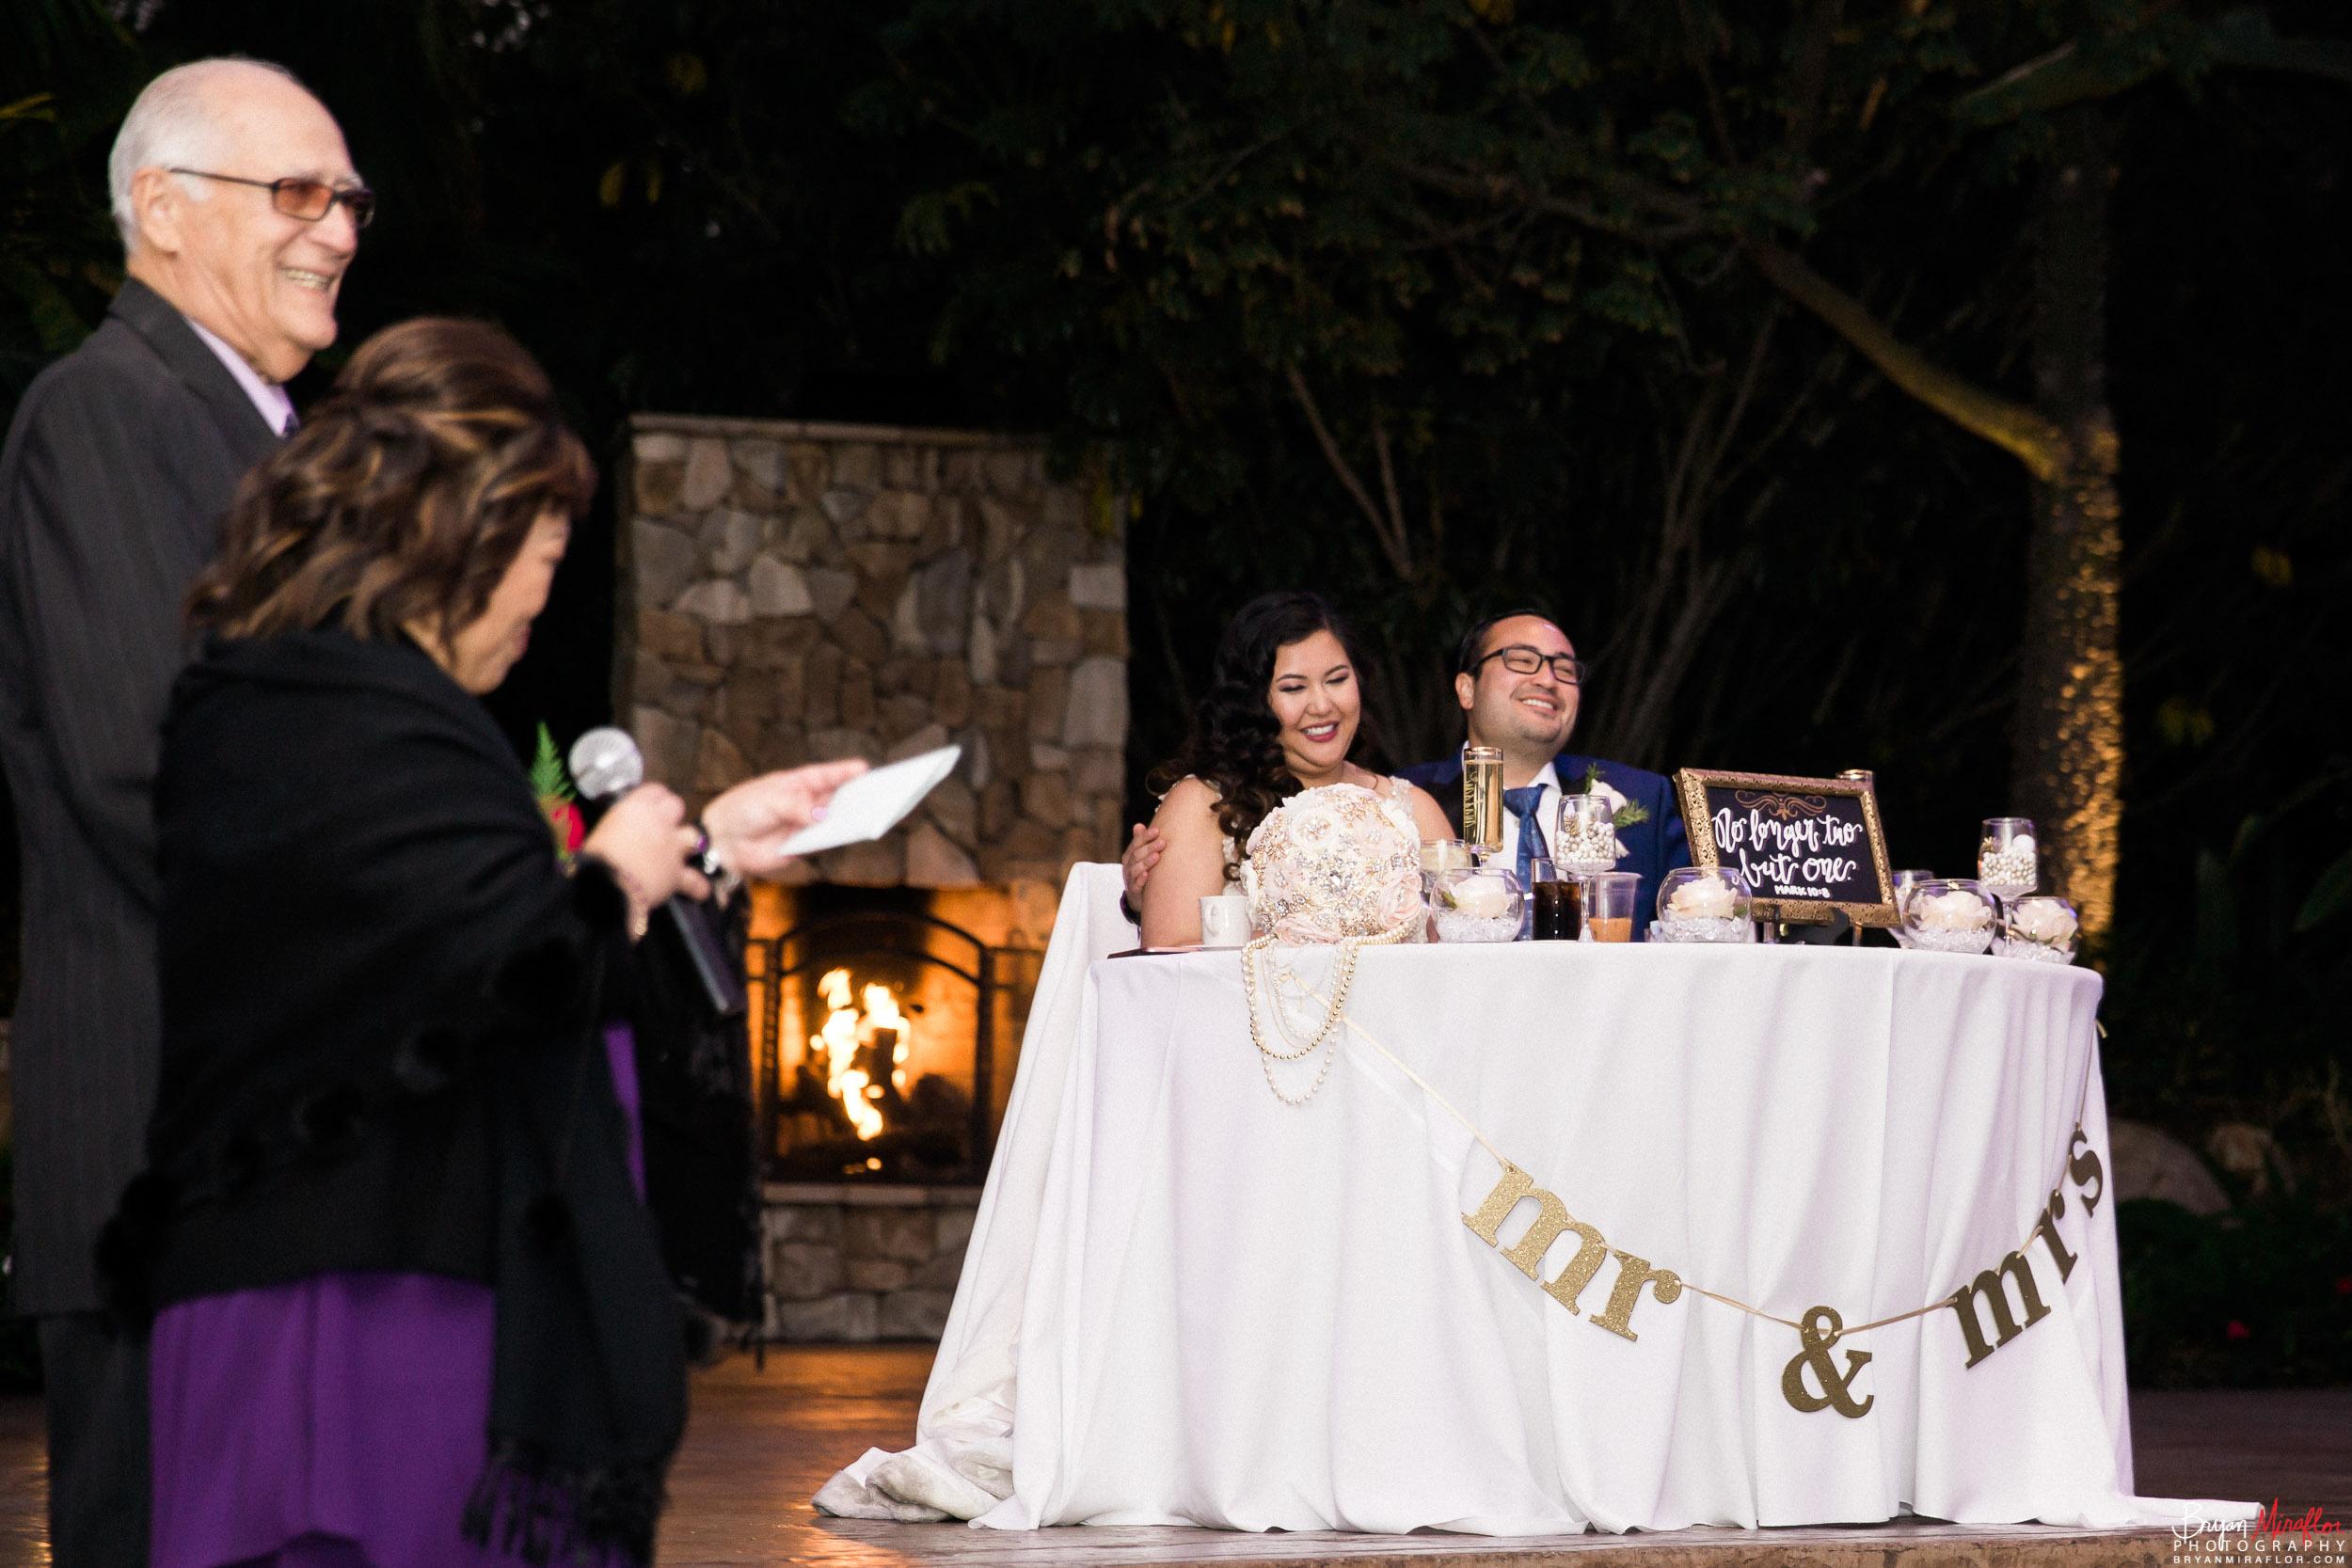 Bryan-Miraflor-Photography-Hannah-Jonathan-Married-Grand-Traditions-Estate-Gardens-Fallbrook-20171222-191.jpg